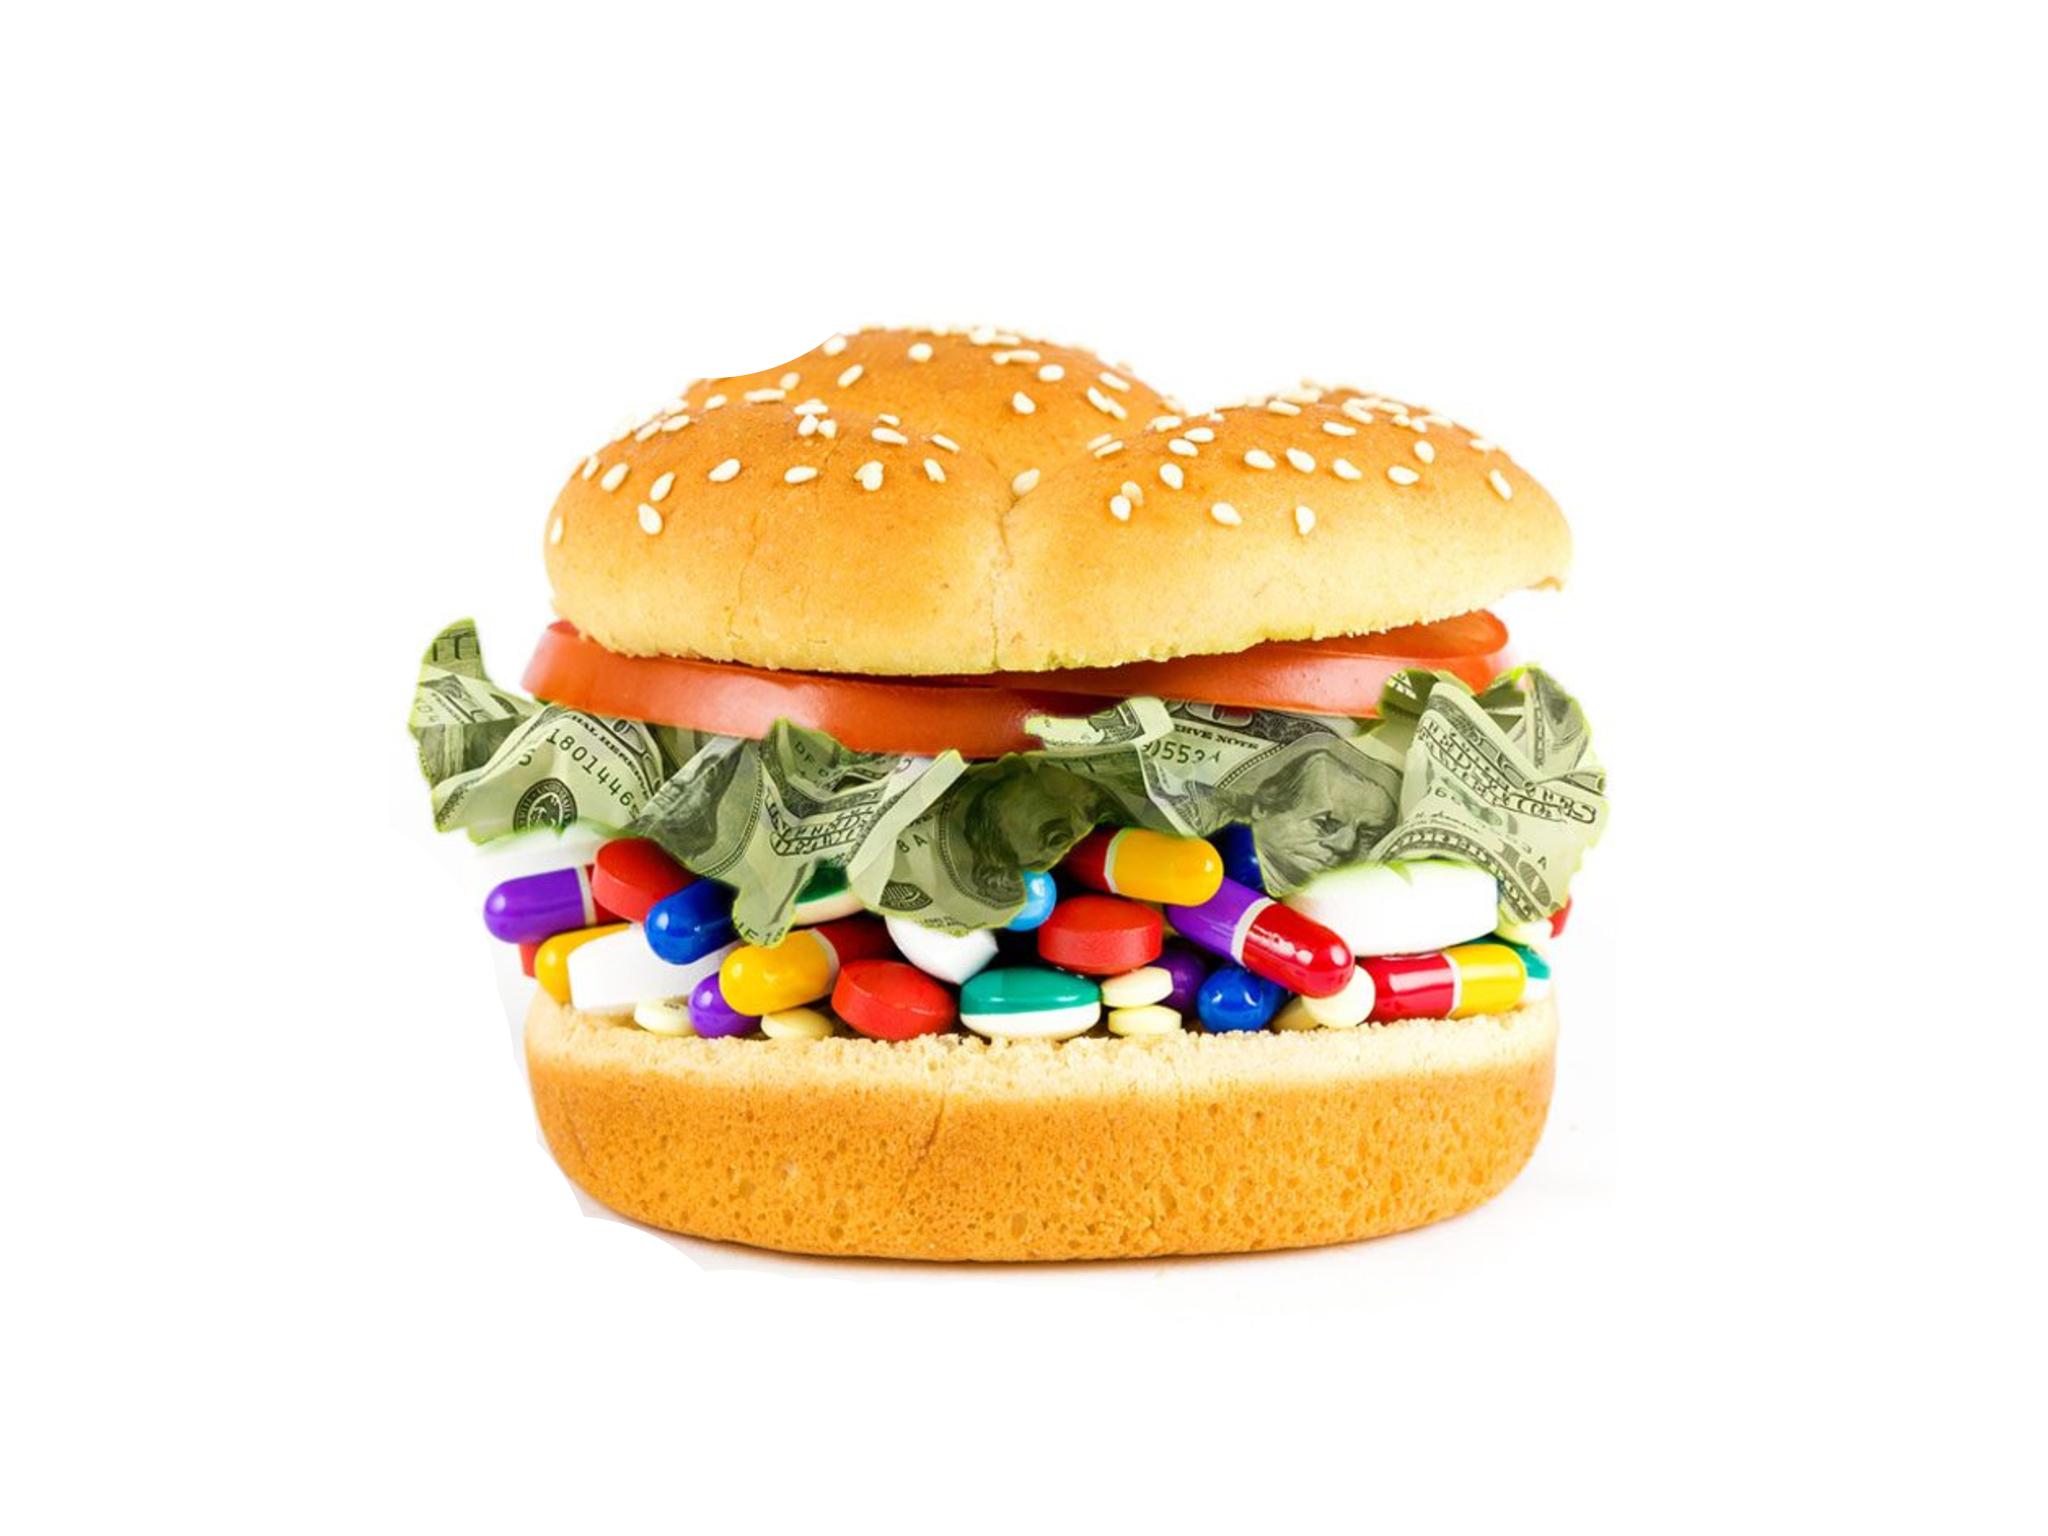 What the Health, documental sobre el veganismo